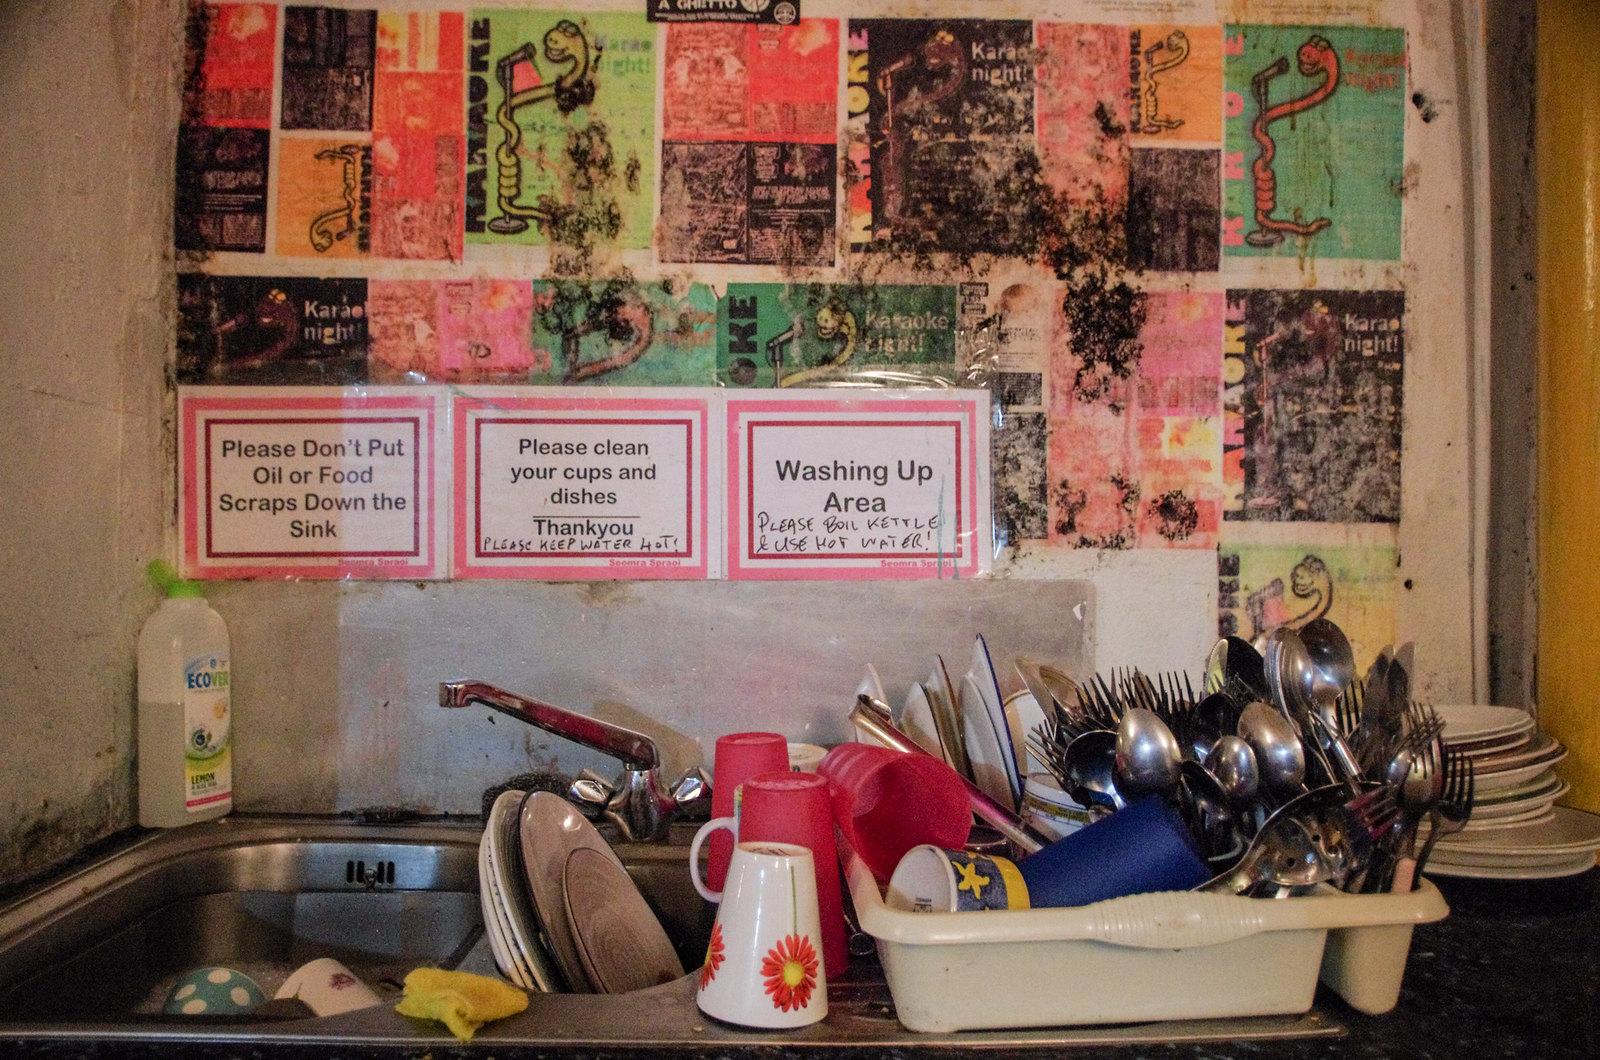 Dublin alternatif - Seomra Spraoi - The dishwasher notice